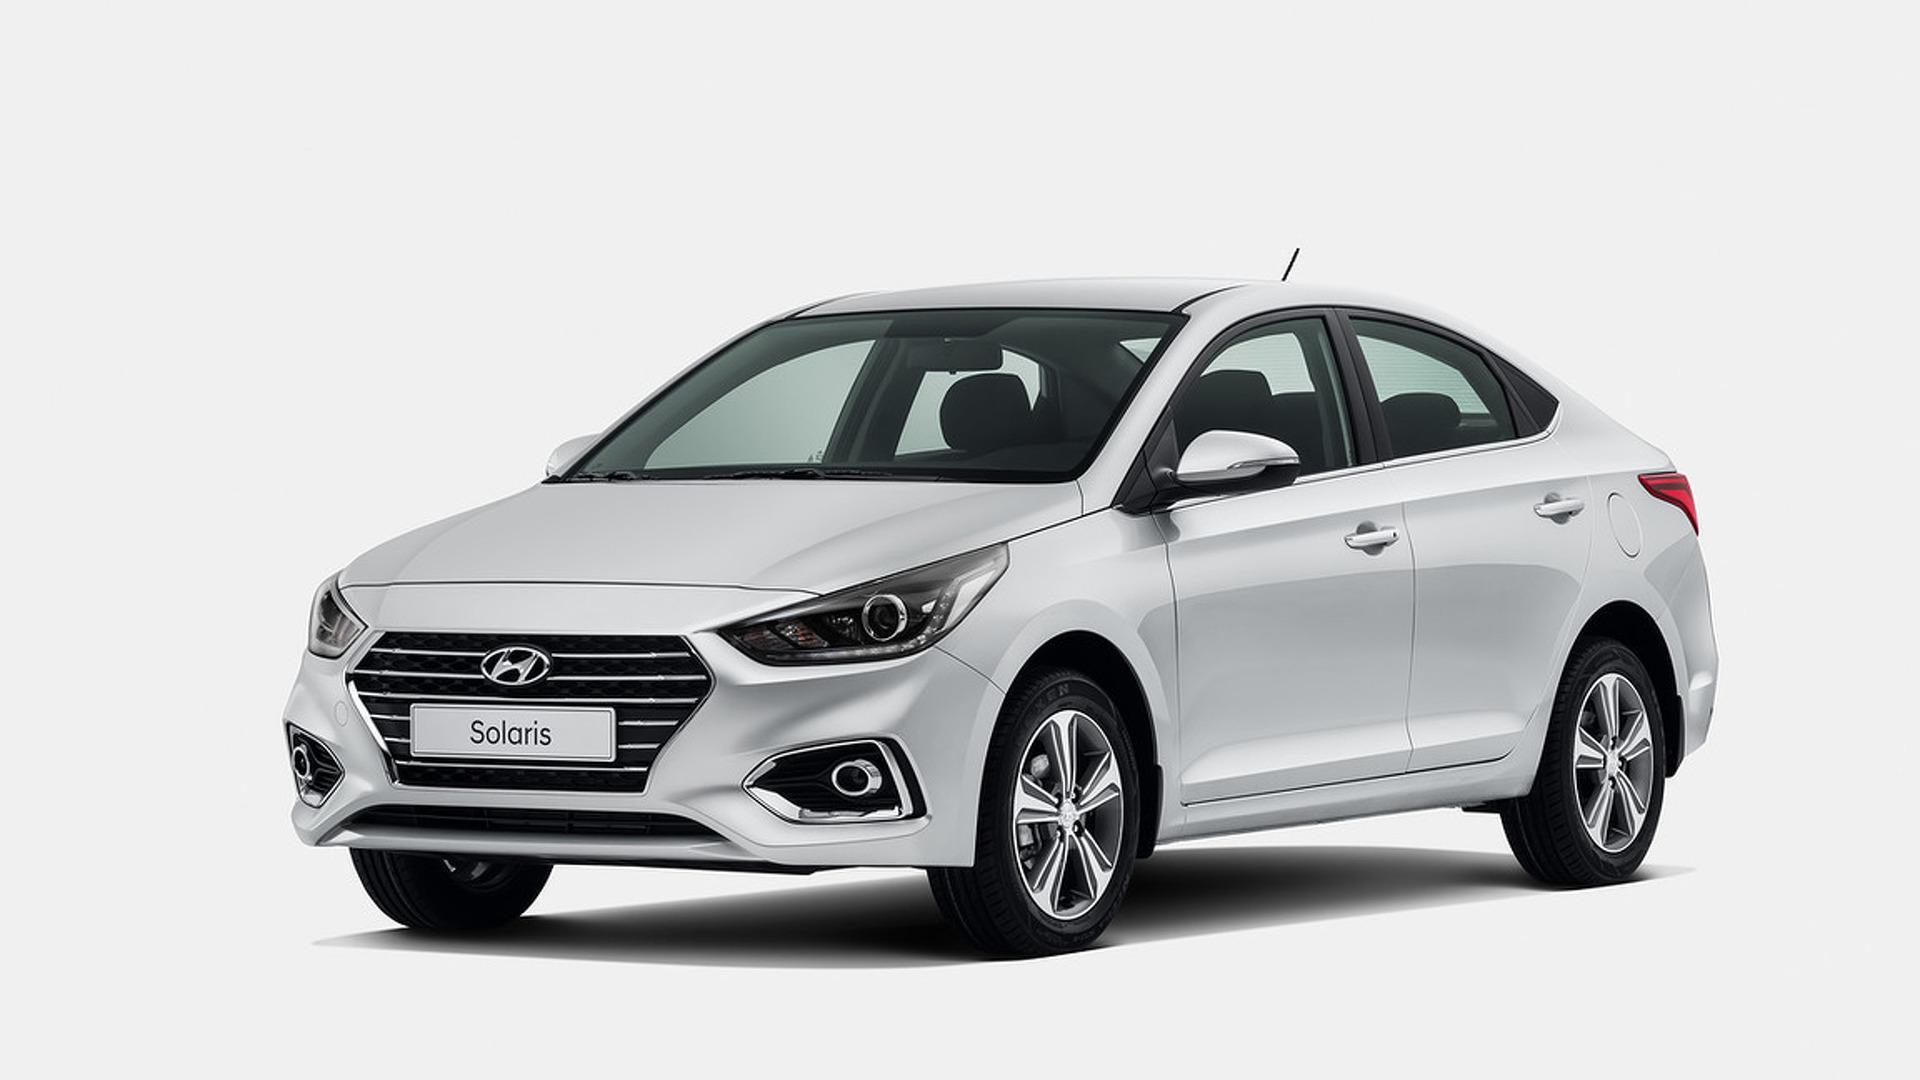 2018 Hyundai Accent Ipucu Resim Galerisi